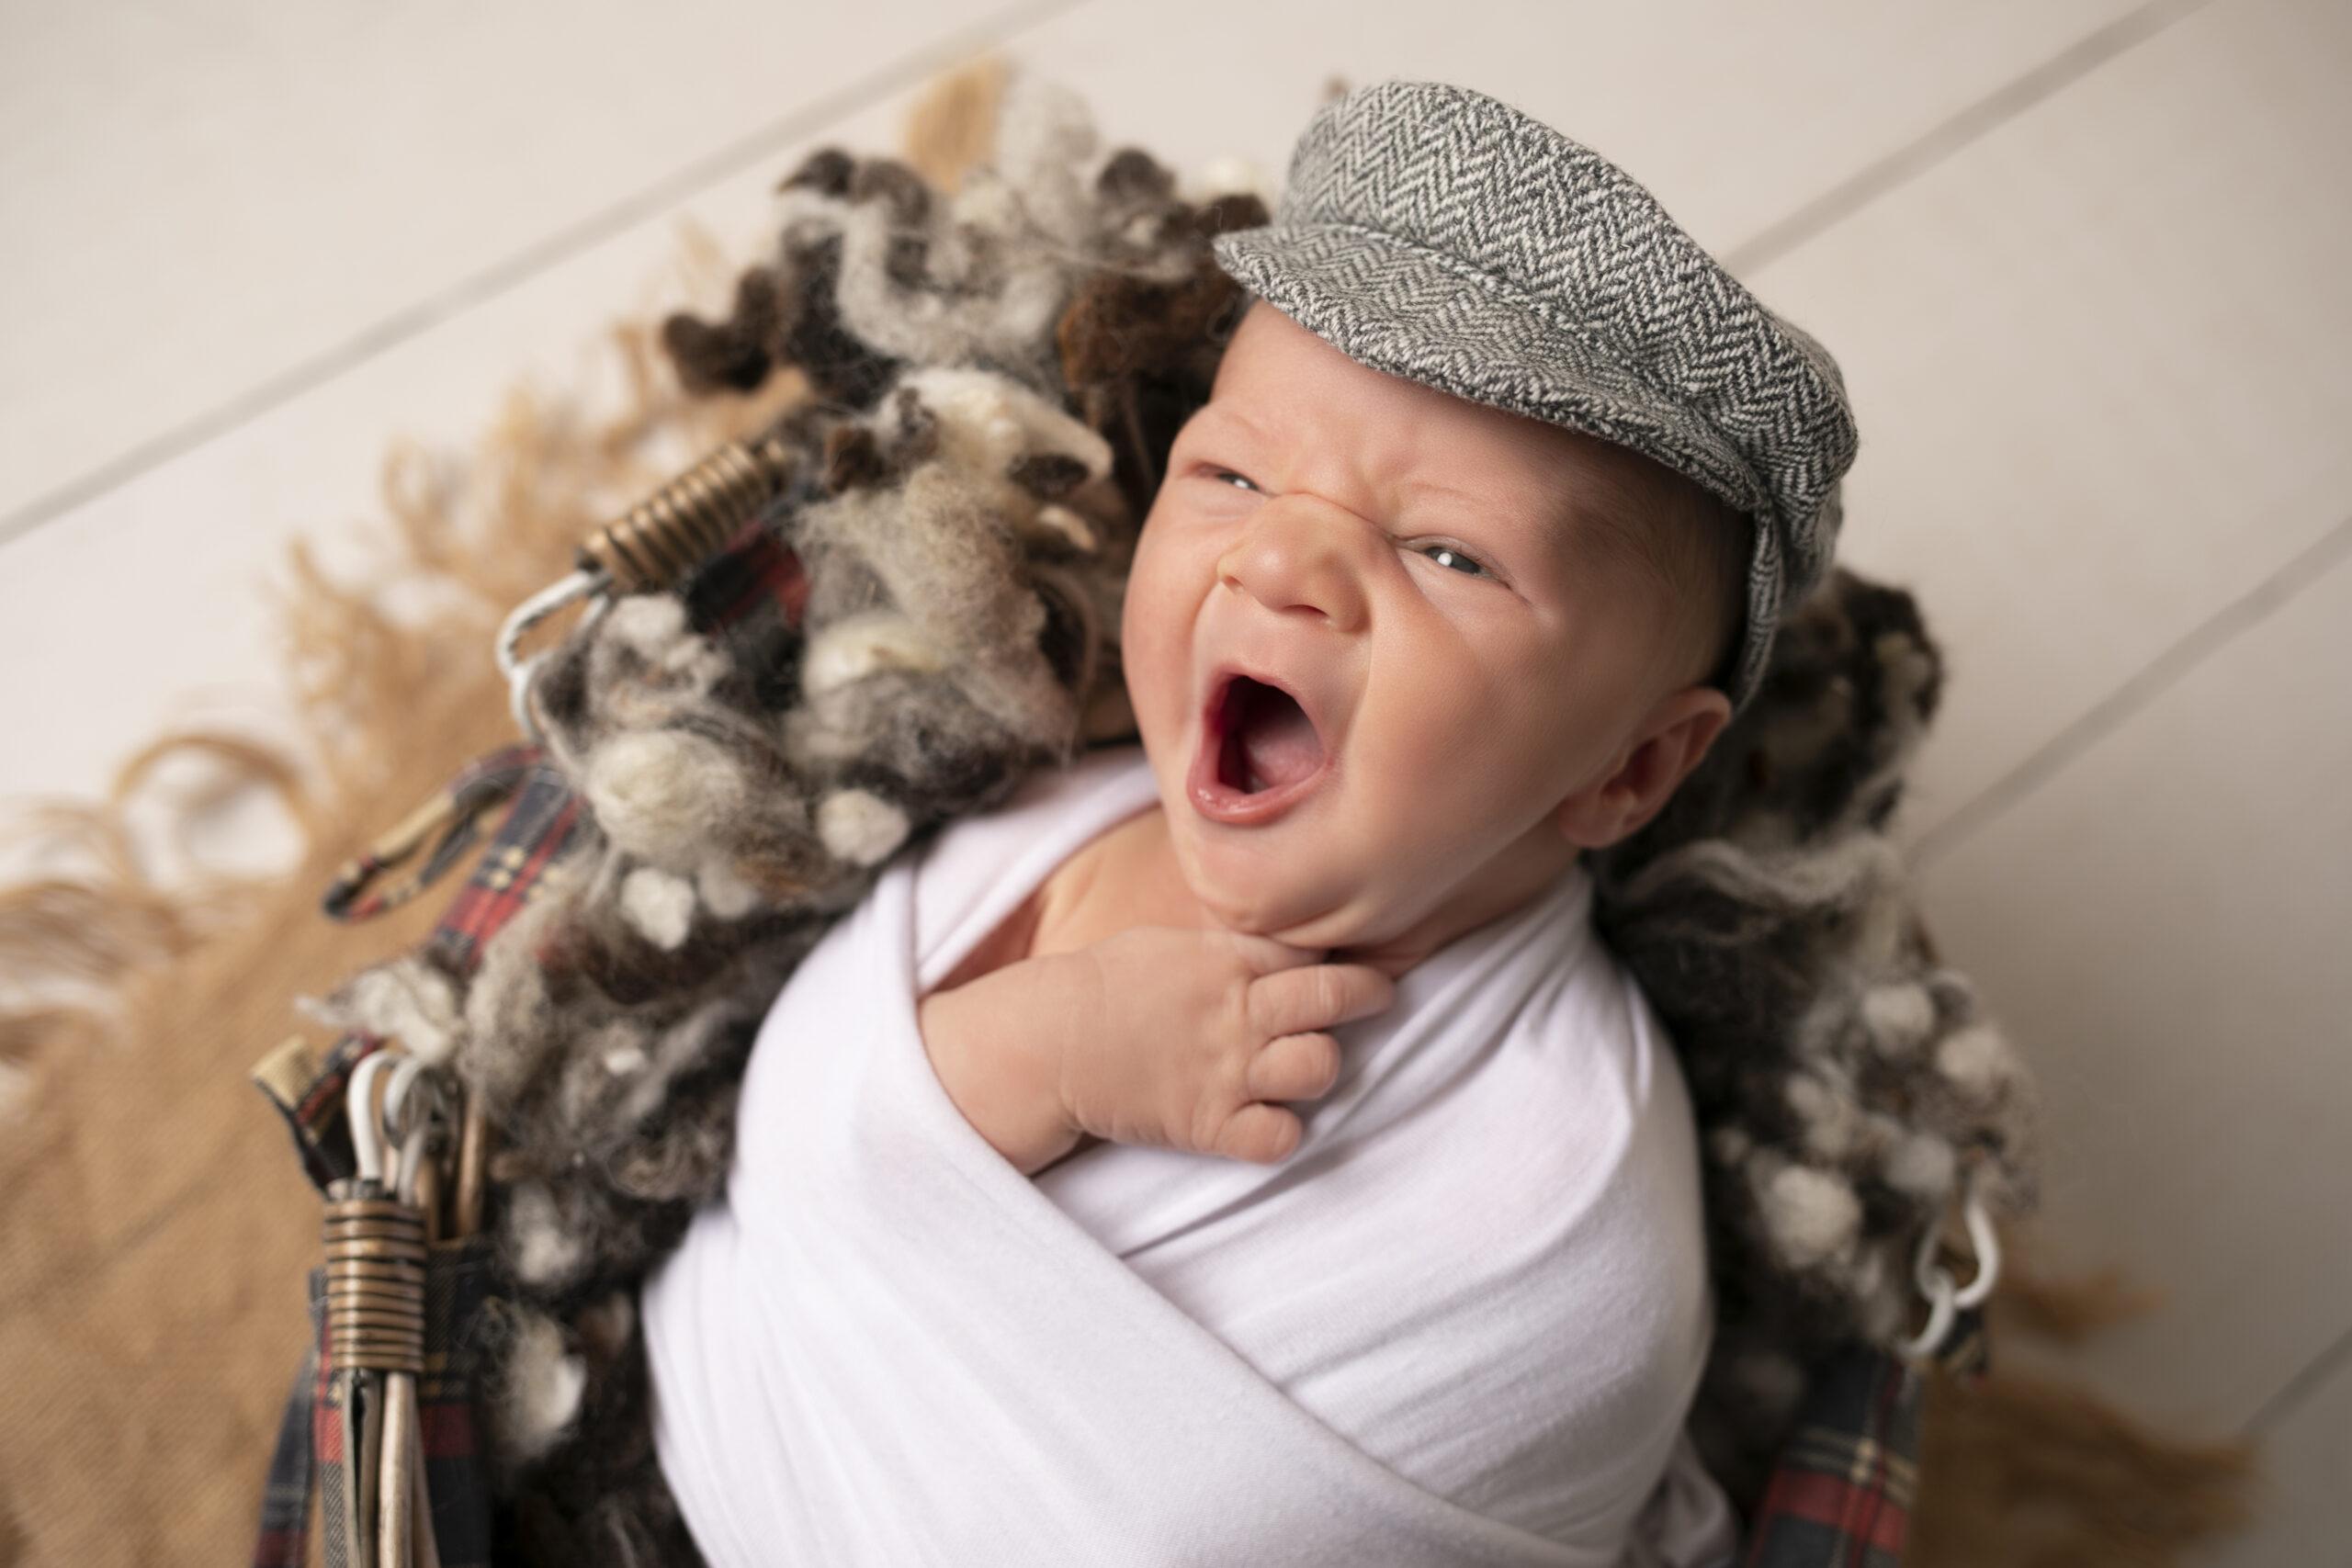 Peekaboo Liverpool newborn baby yawning wearing a flat cap